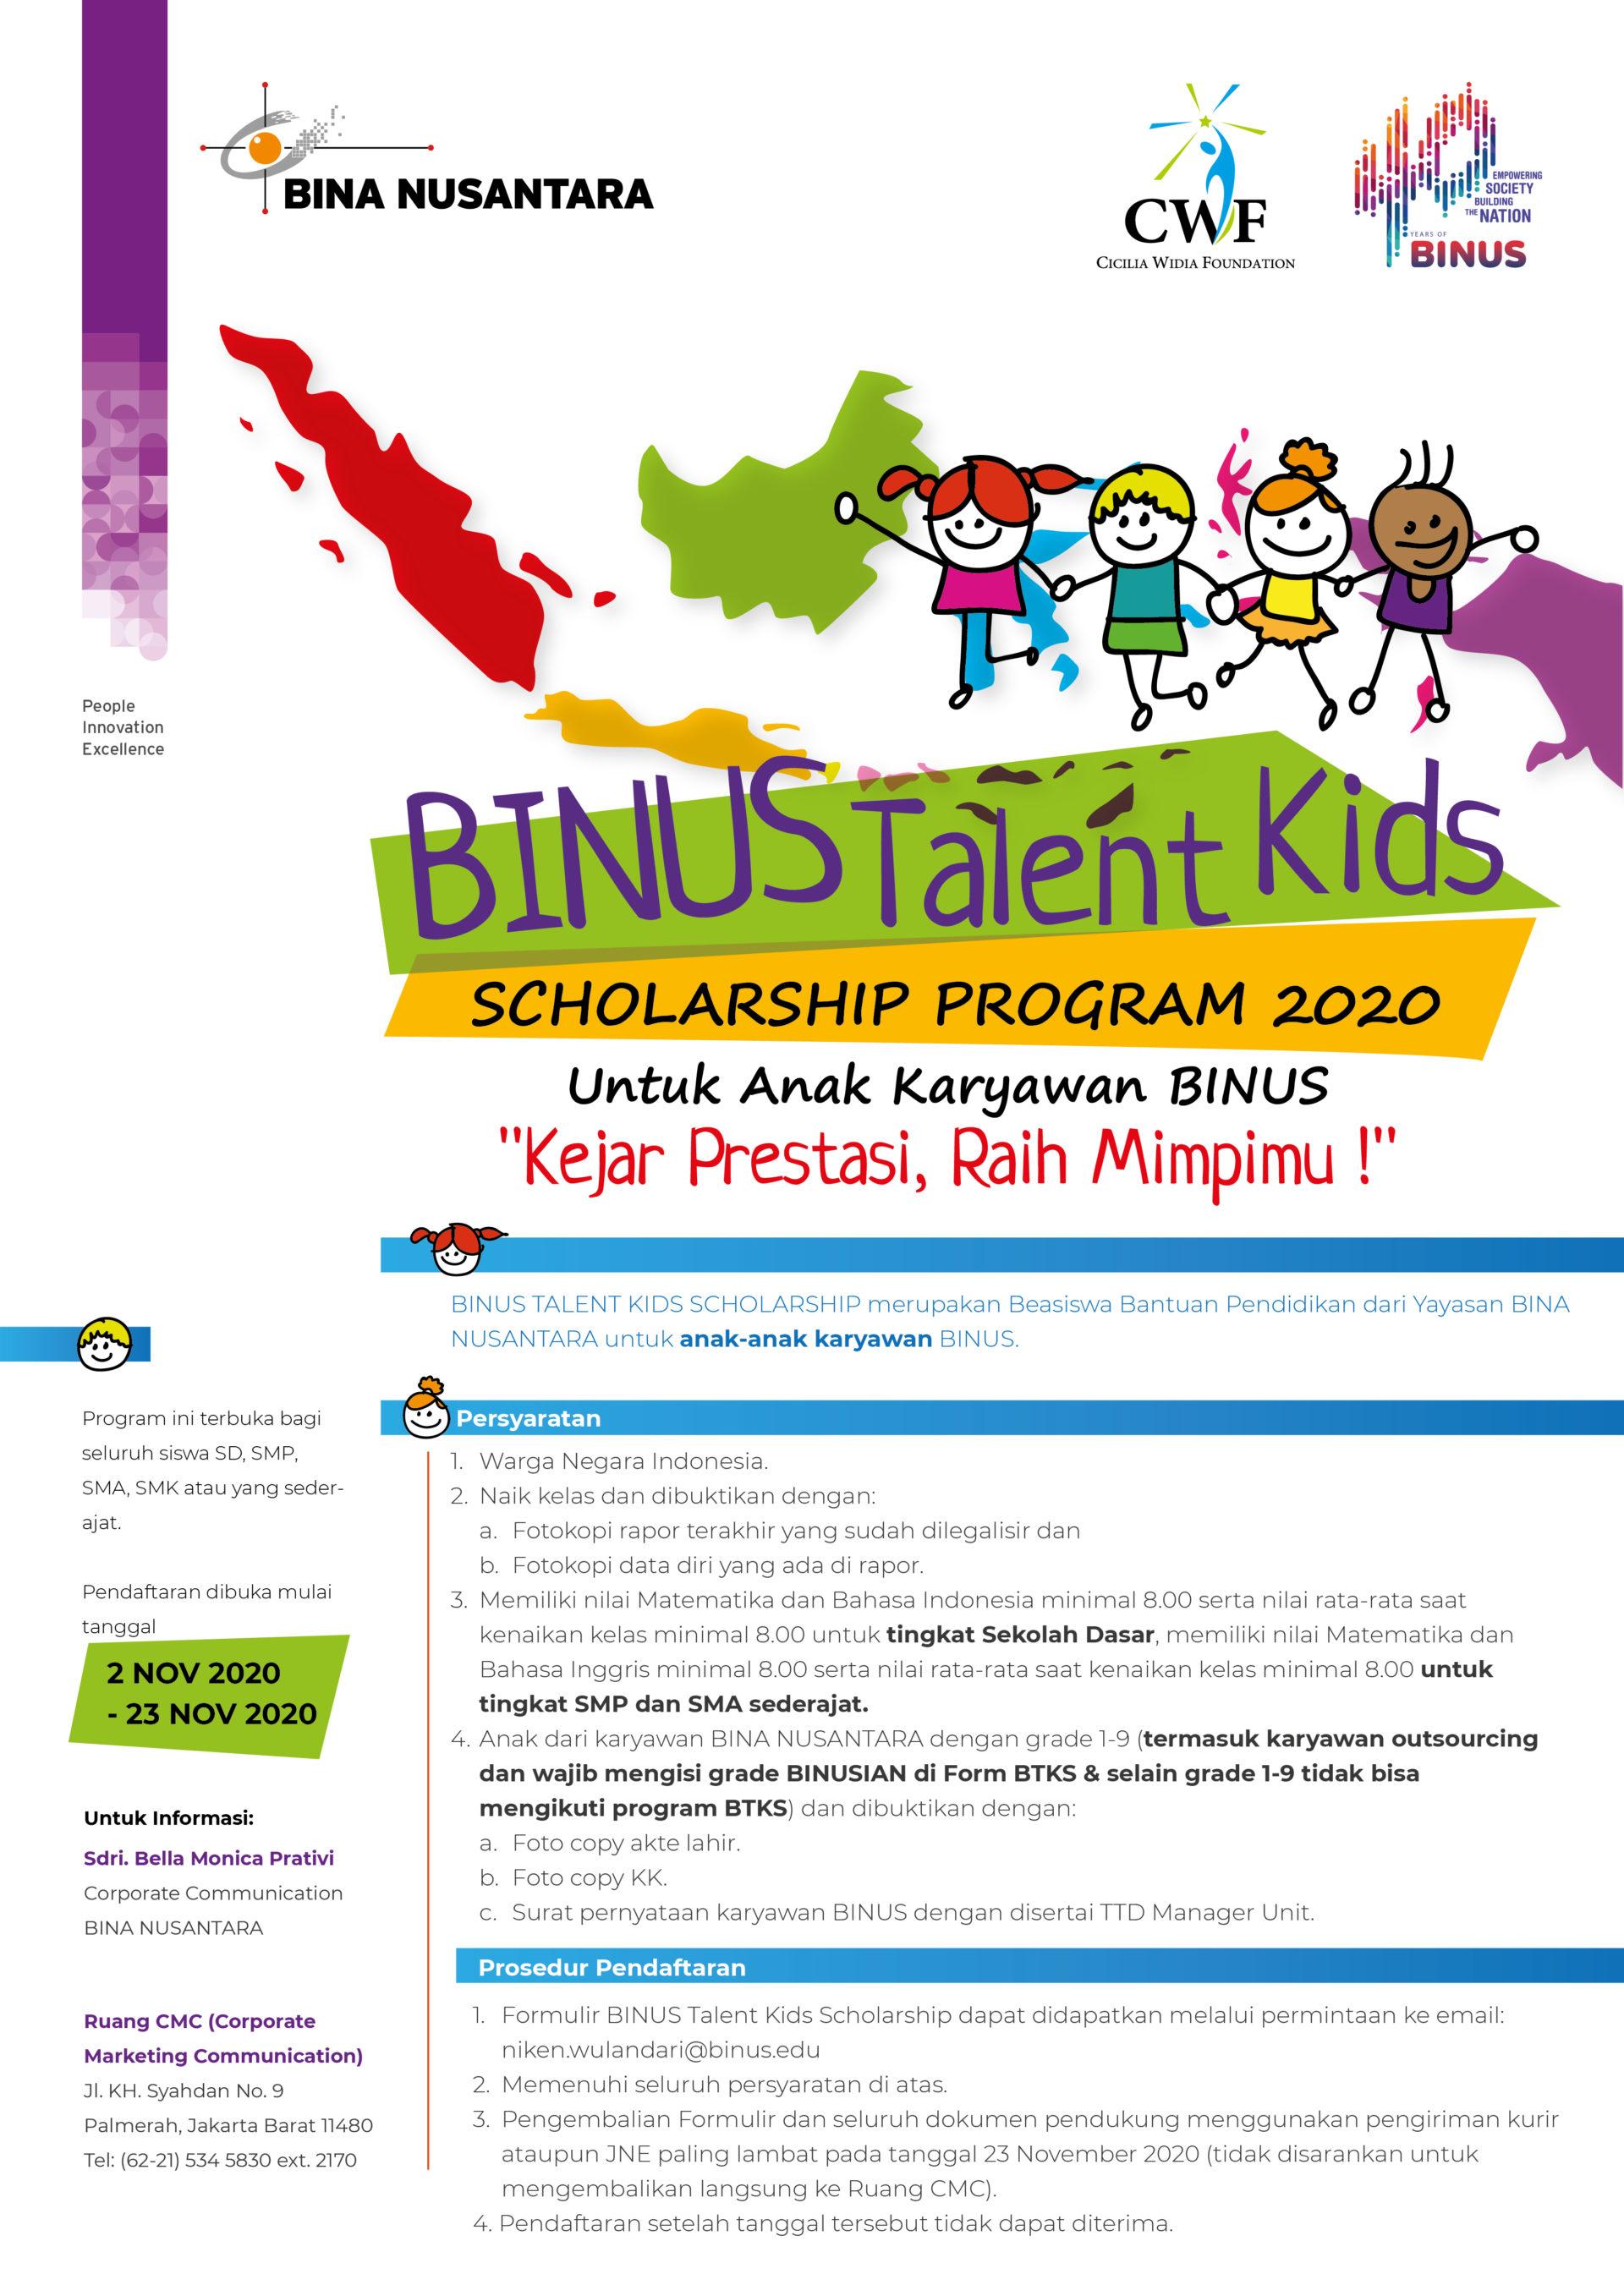 BINUS Talent Kids Scholarship 2020